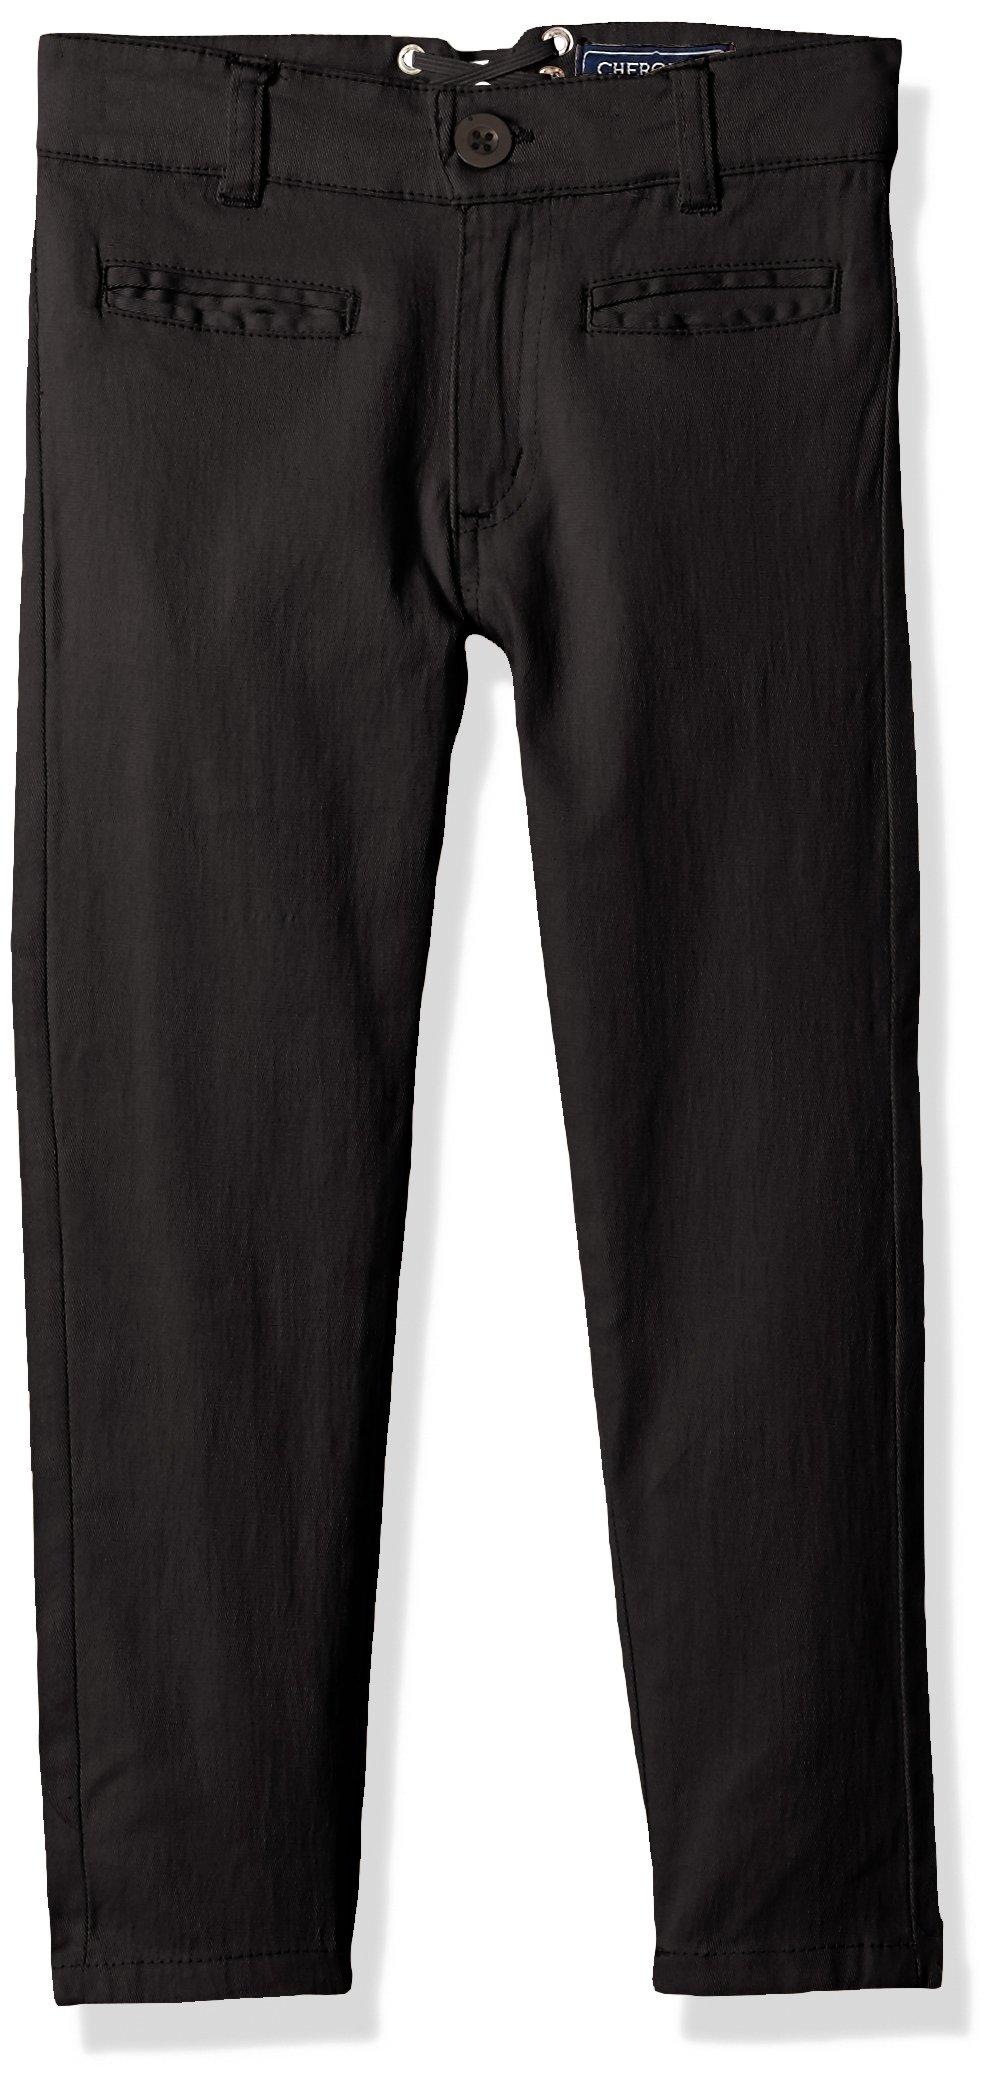 Cherokee Big Girls' Uniform Strectch Twill Skinny Pant with Lace Detail, Black, 12